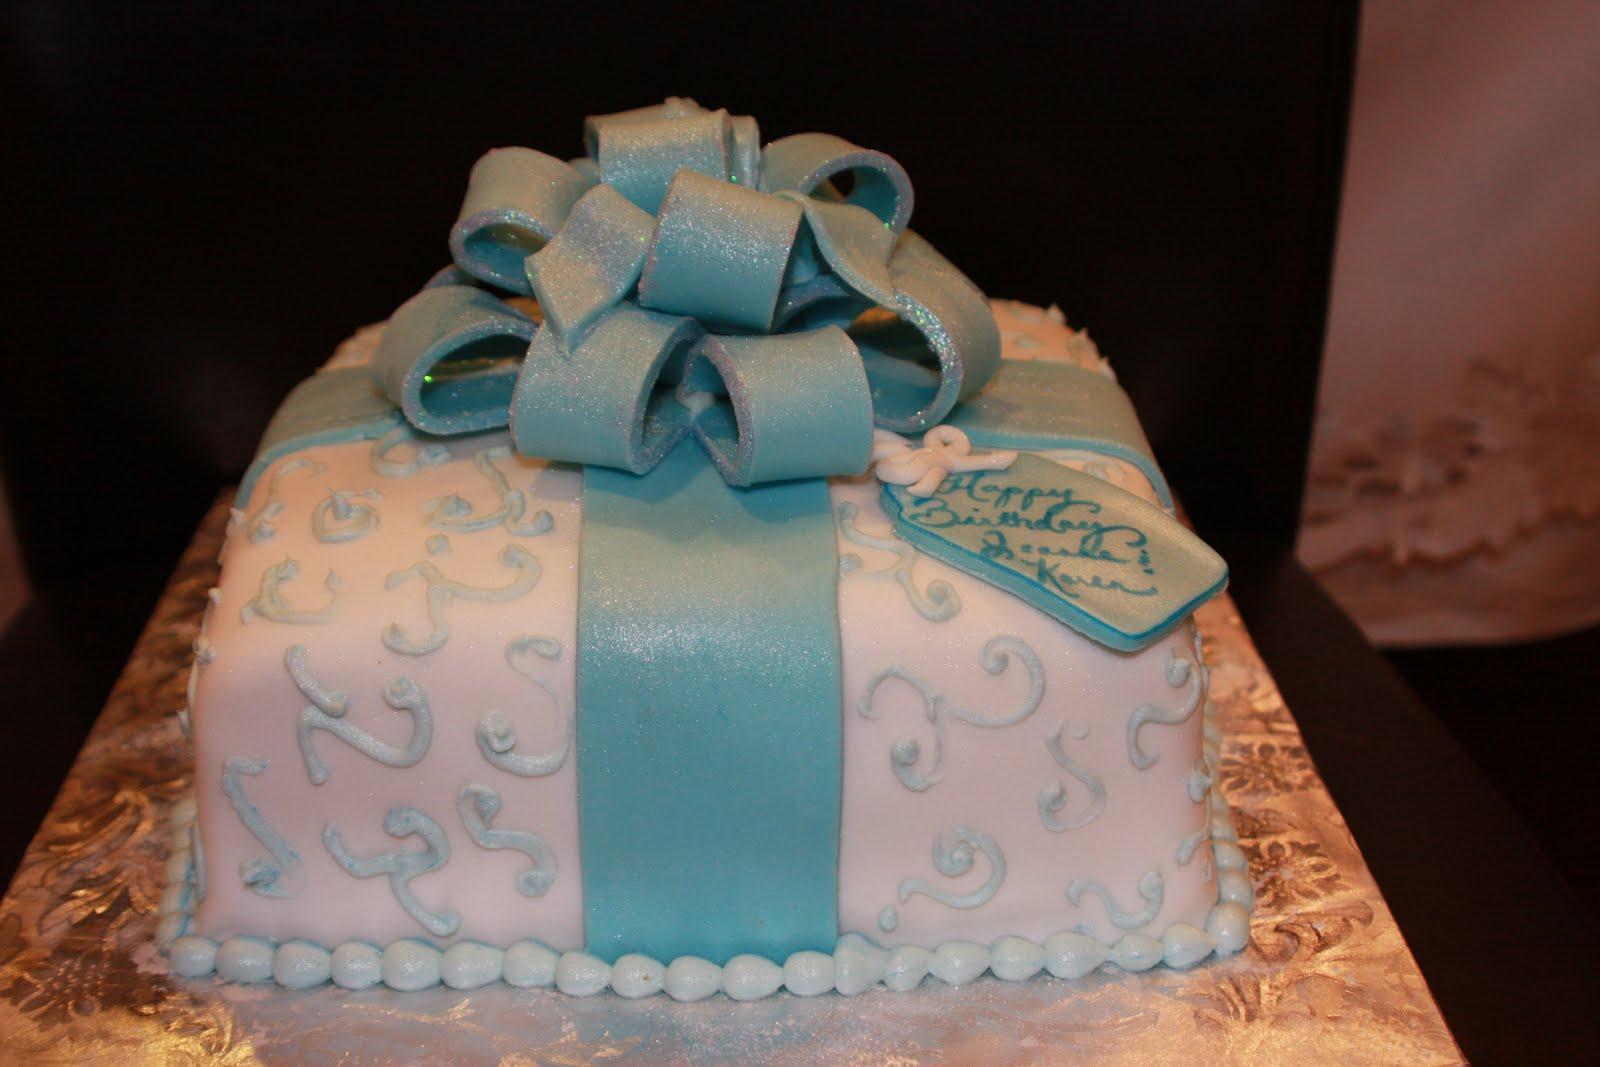 Kels Cake Creations Birthday Present Cake